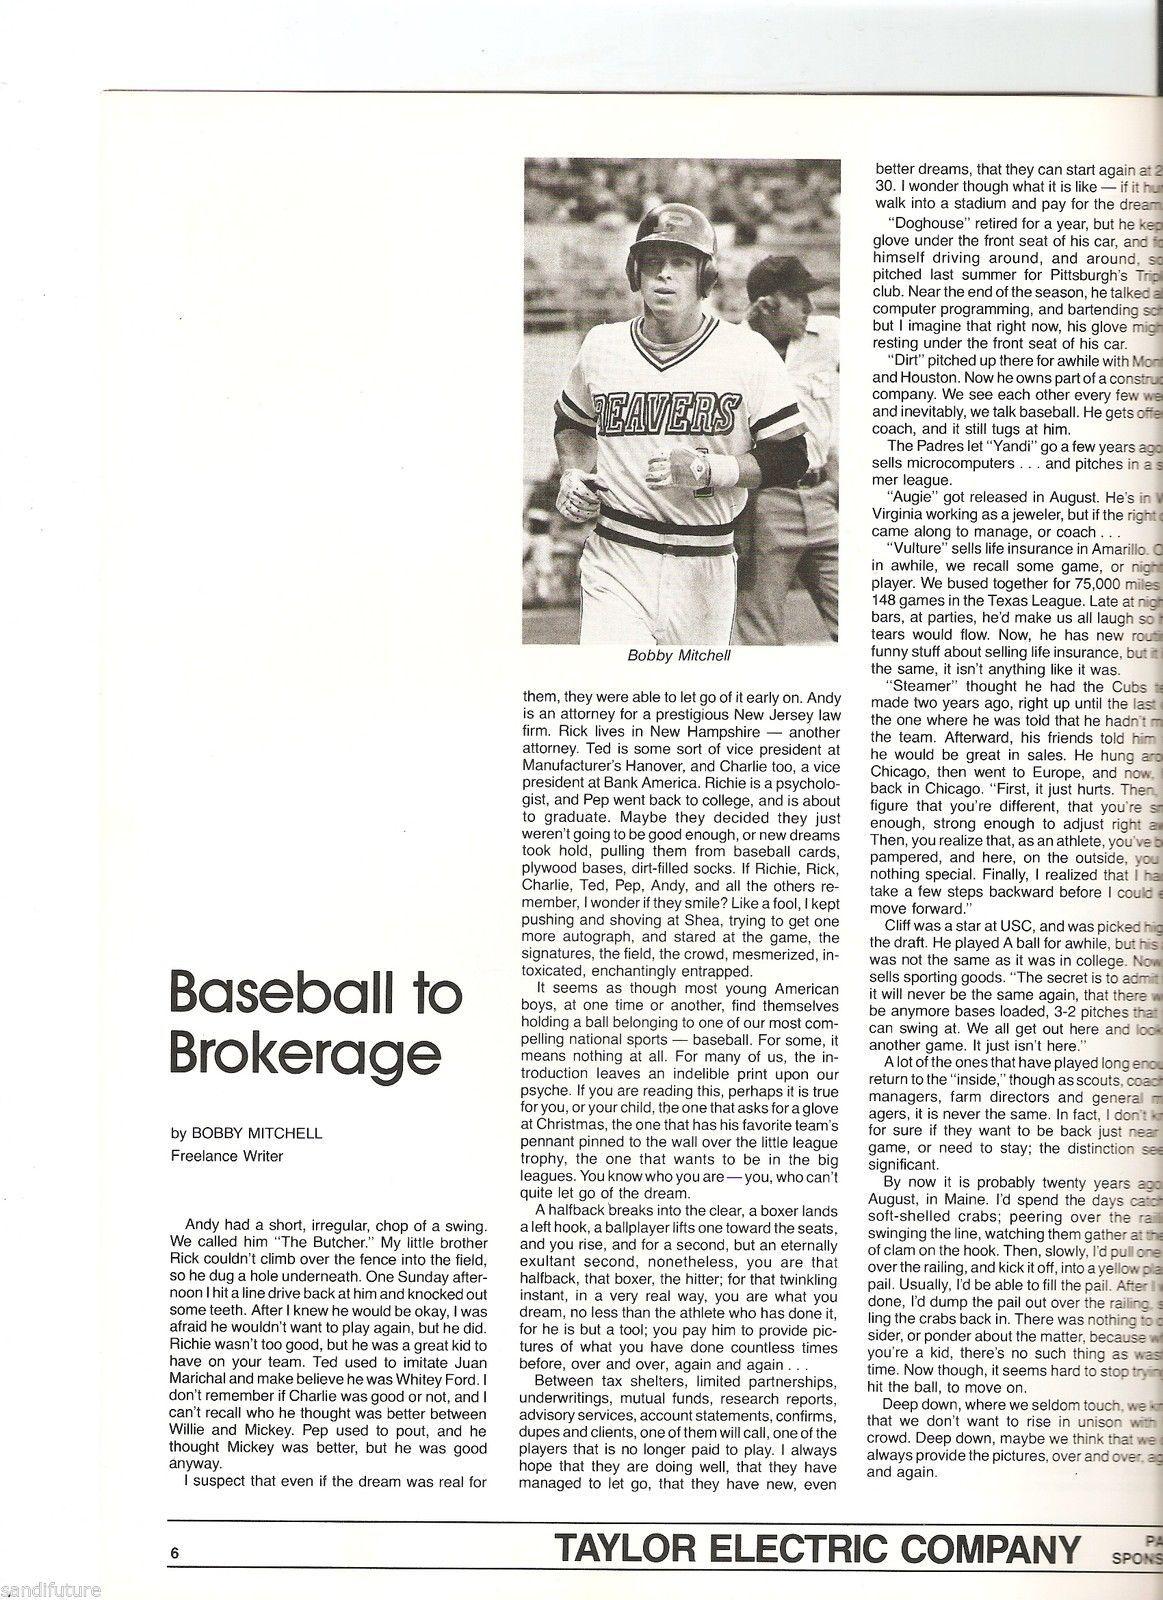 1984 Pete Ward Baseball Clinic program Lou Piniella Boog Powell Kevin McBride image 3